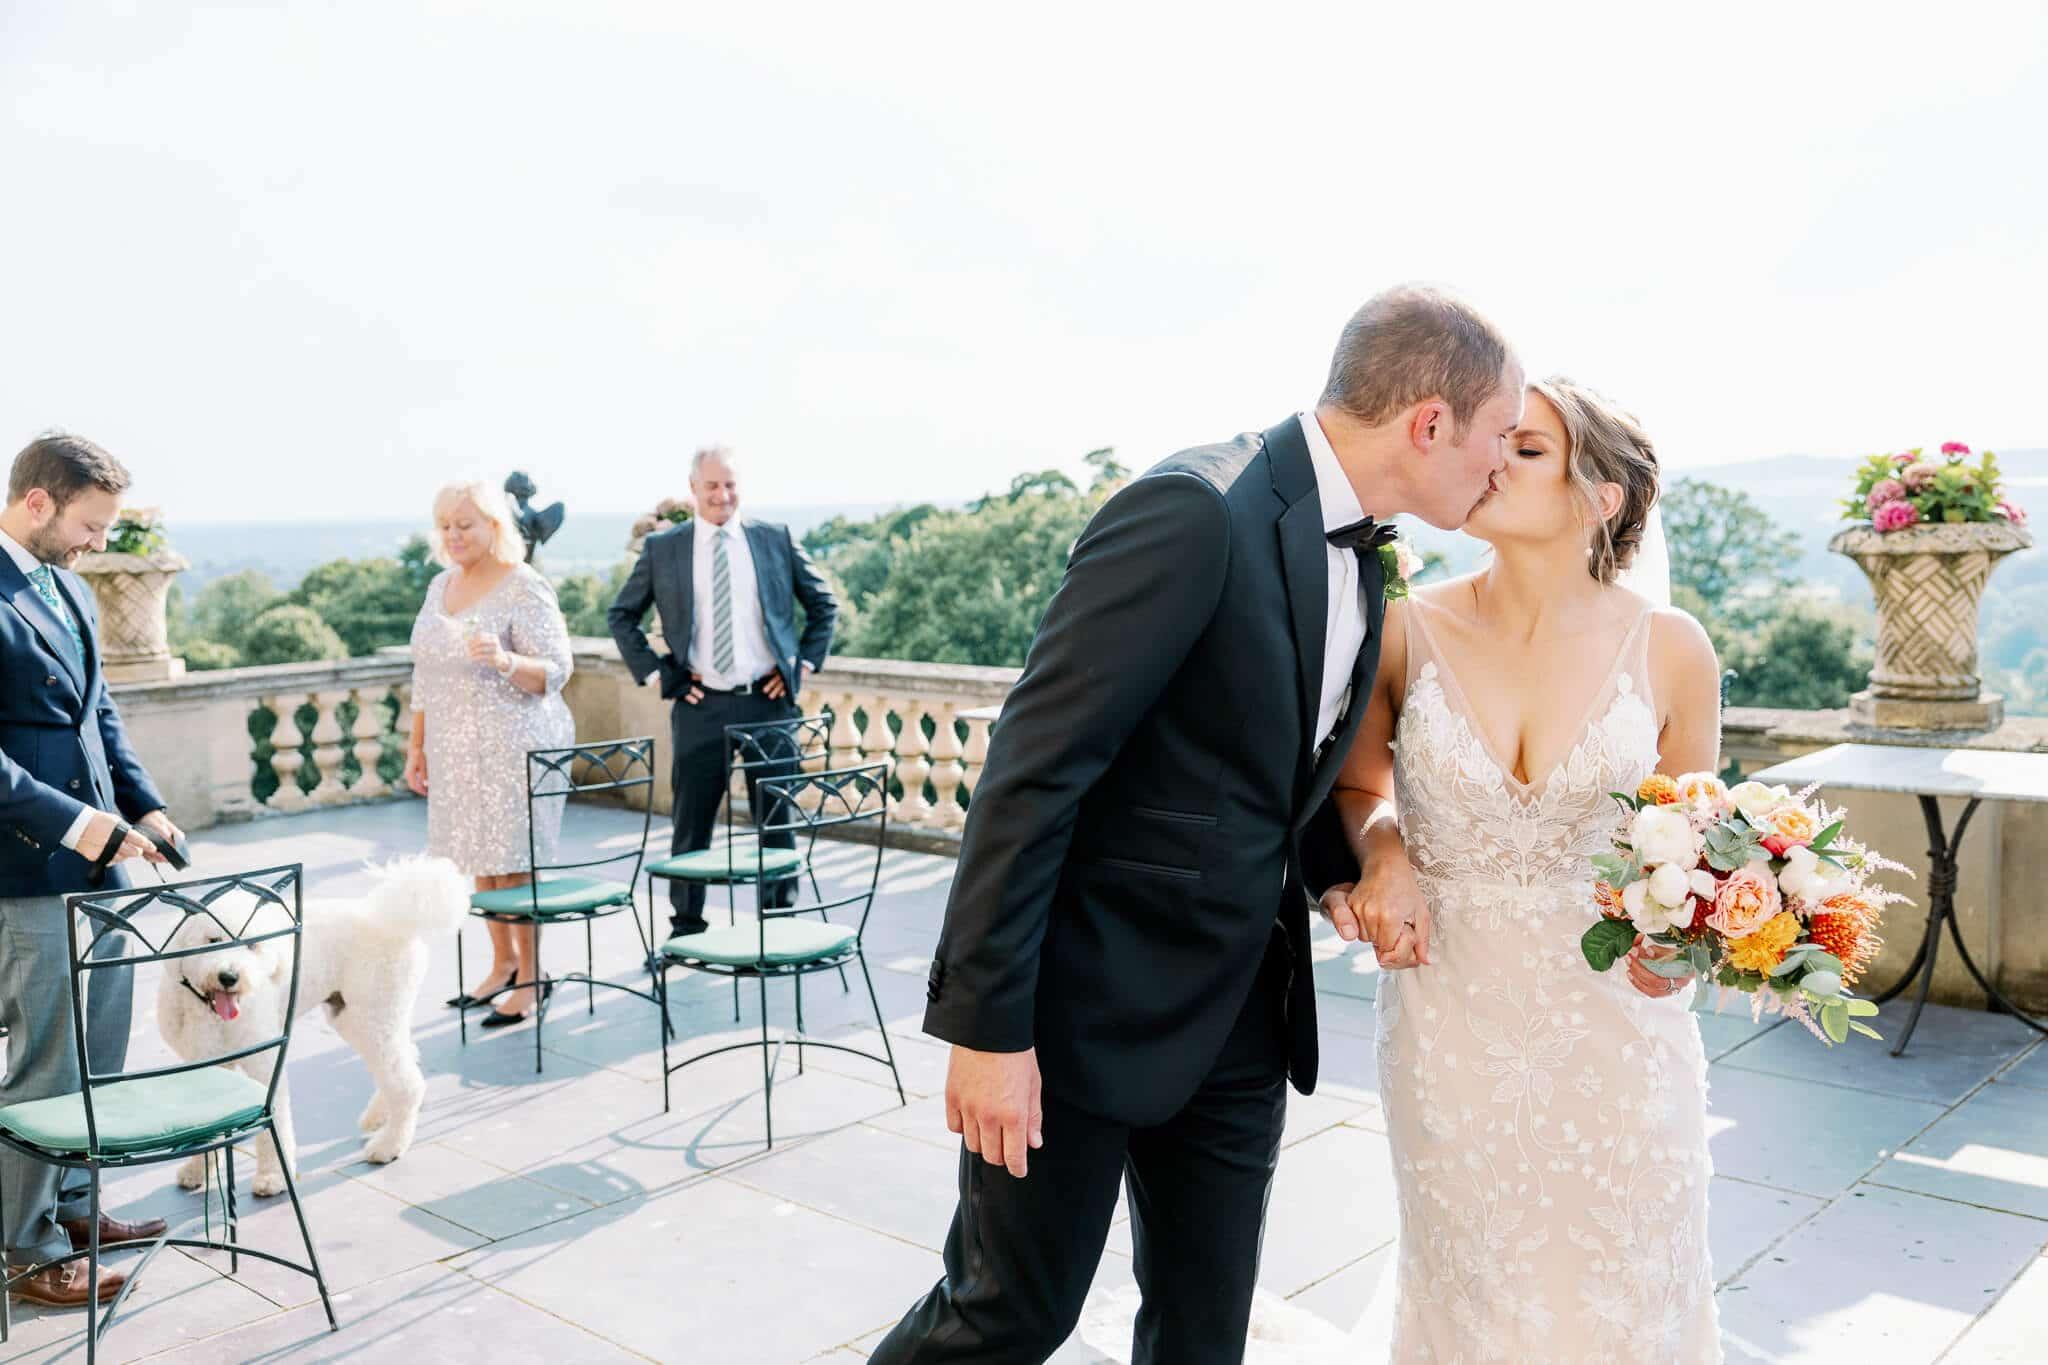 Wedding photography berkshire outdoor ceremony